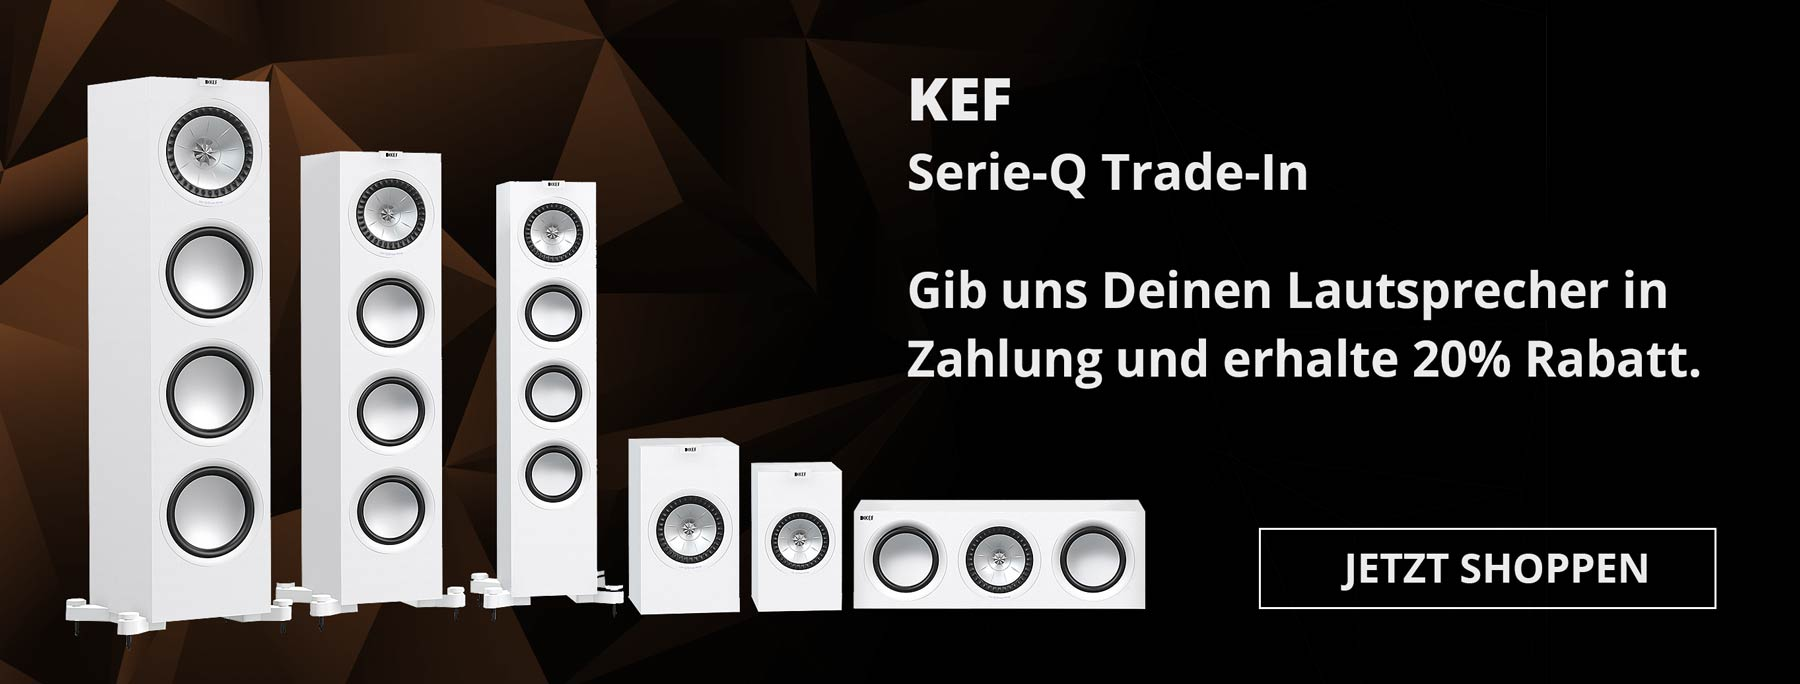 Aktion: KEF Serie-Q Trade-In (Angebot)